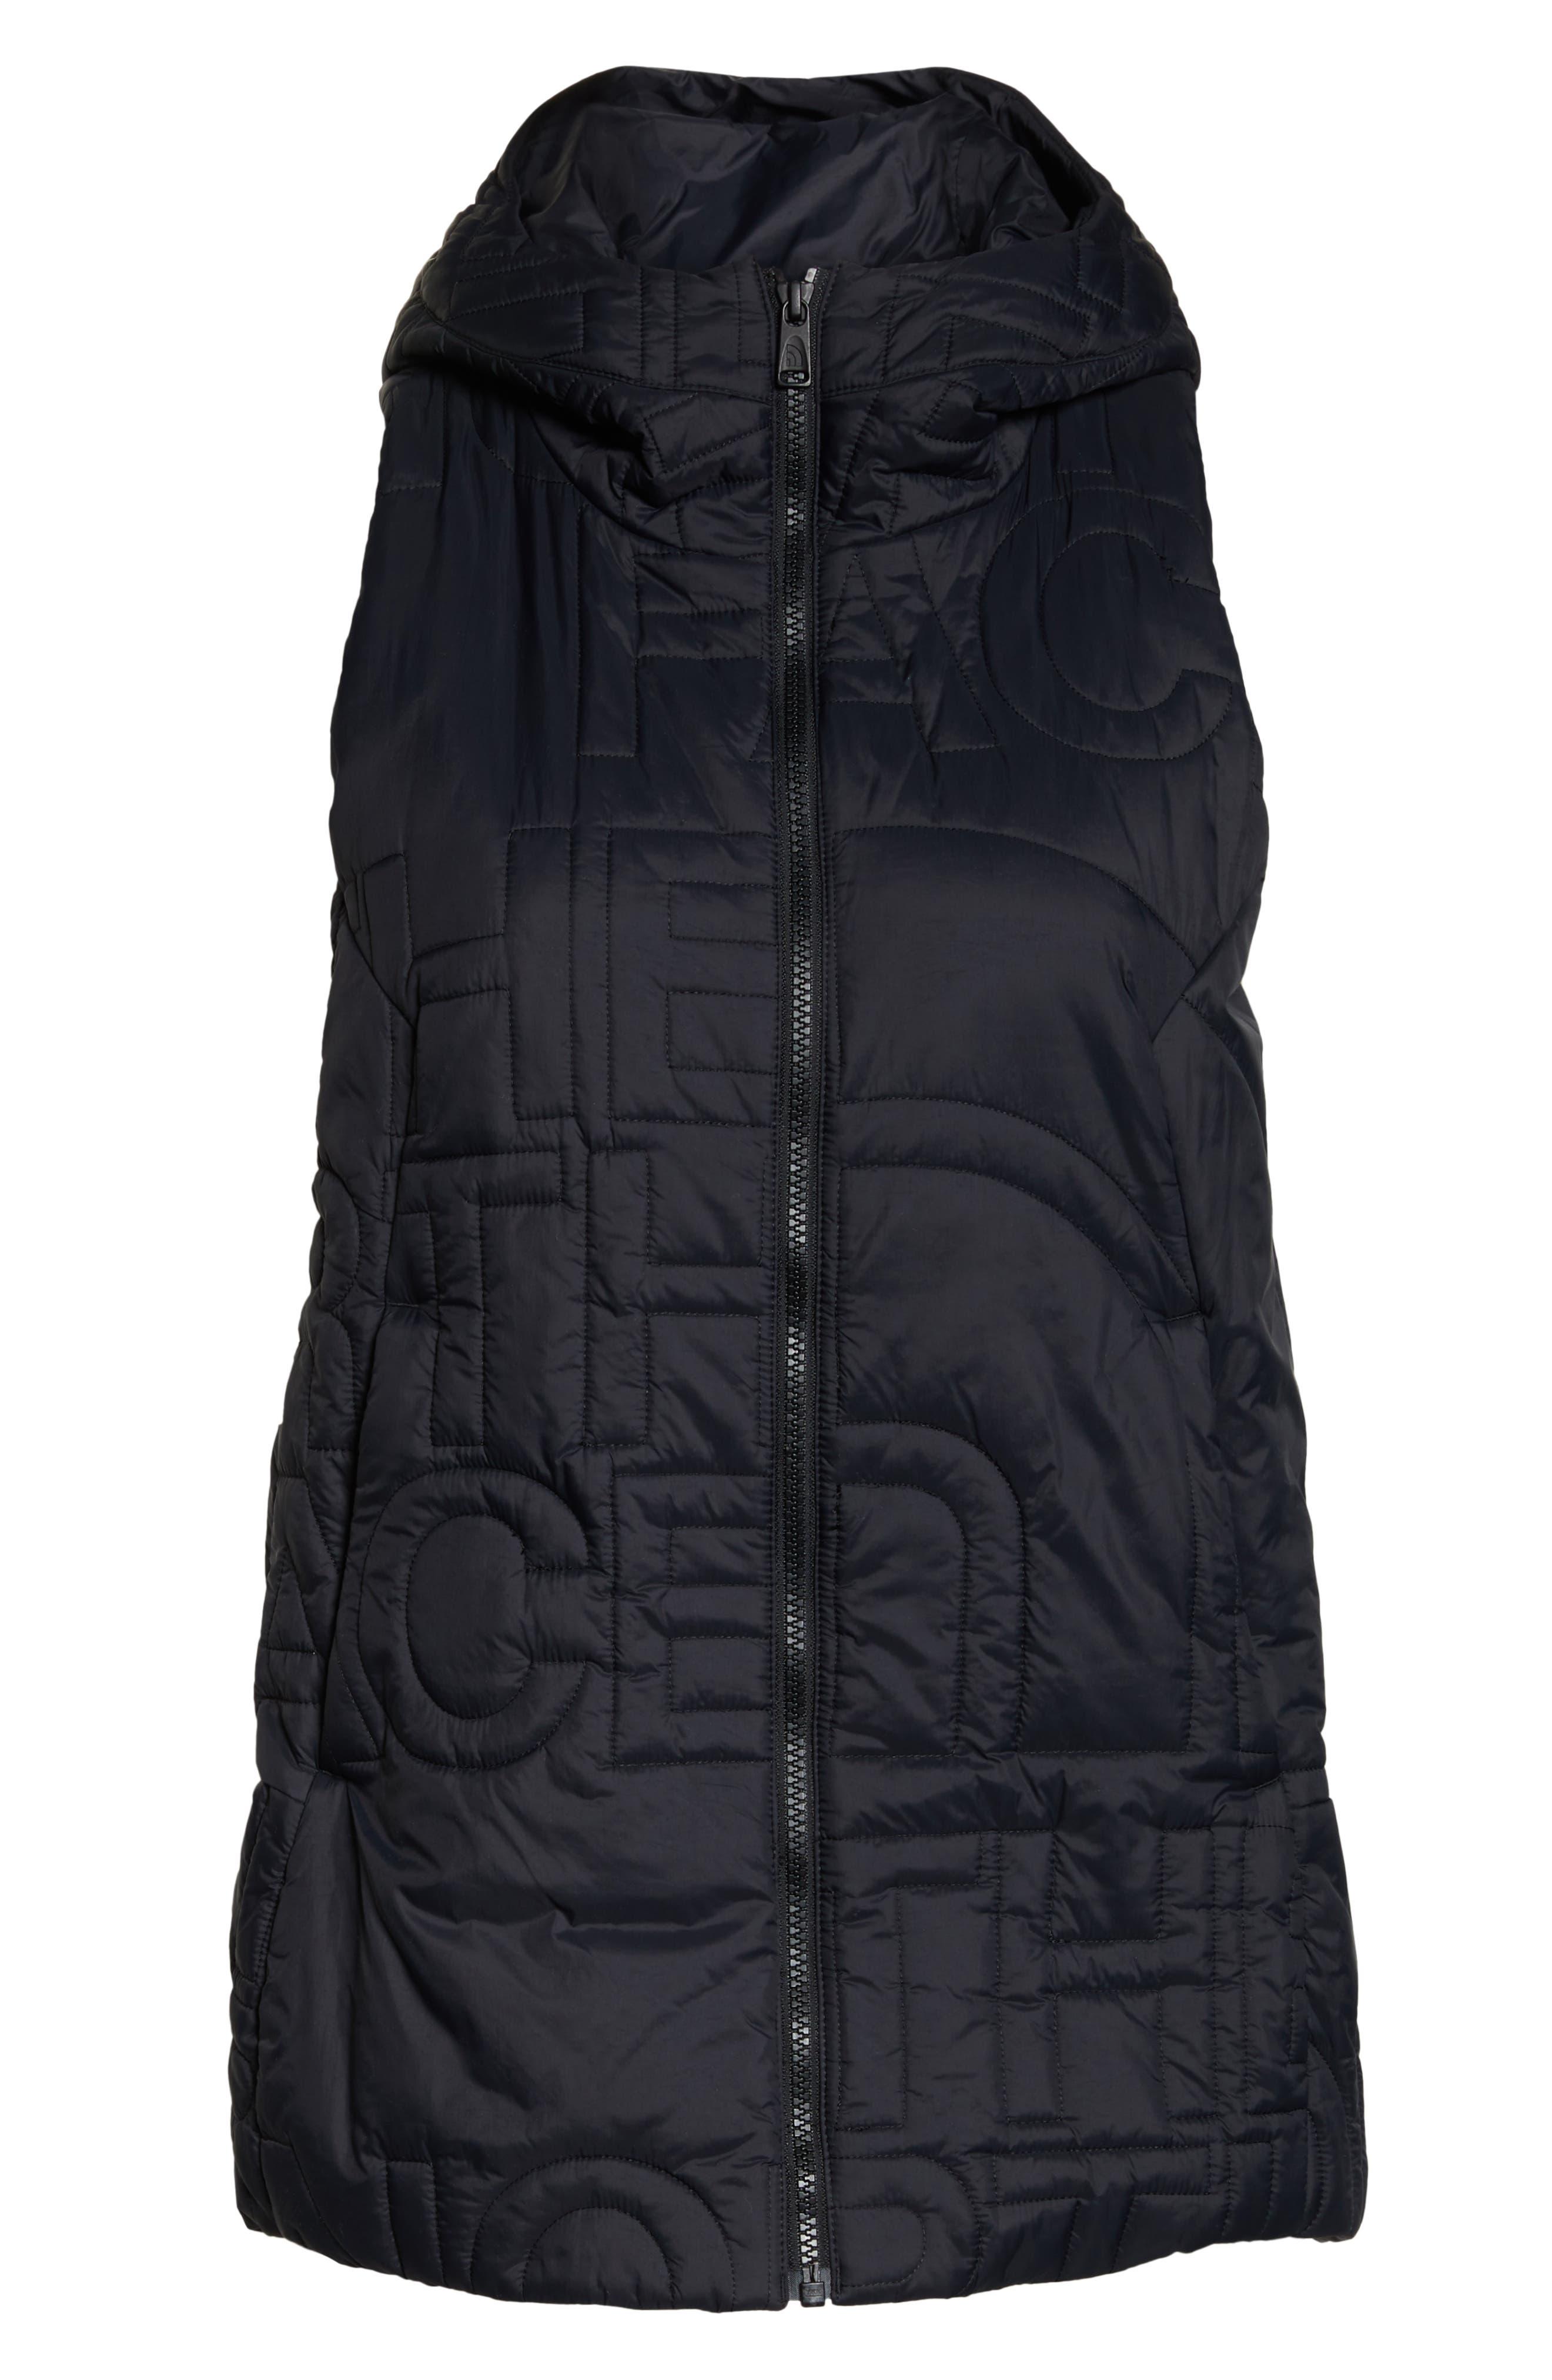 THE NORTH FACE, Alphabet City Water Resistant Heatseeker<sup>™</sup> Vest, Alternate thumbnail 6, color, TNF BLACK/ TNF BLACK